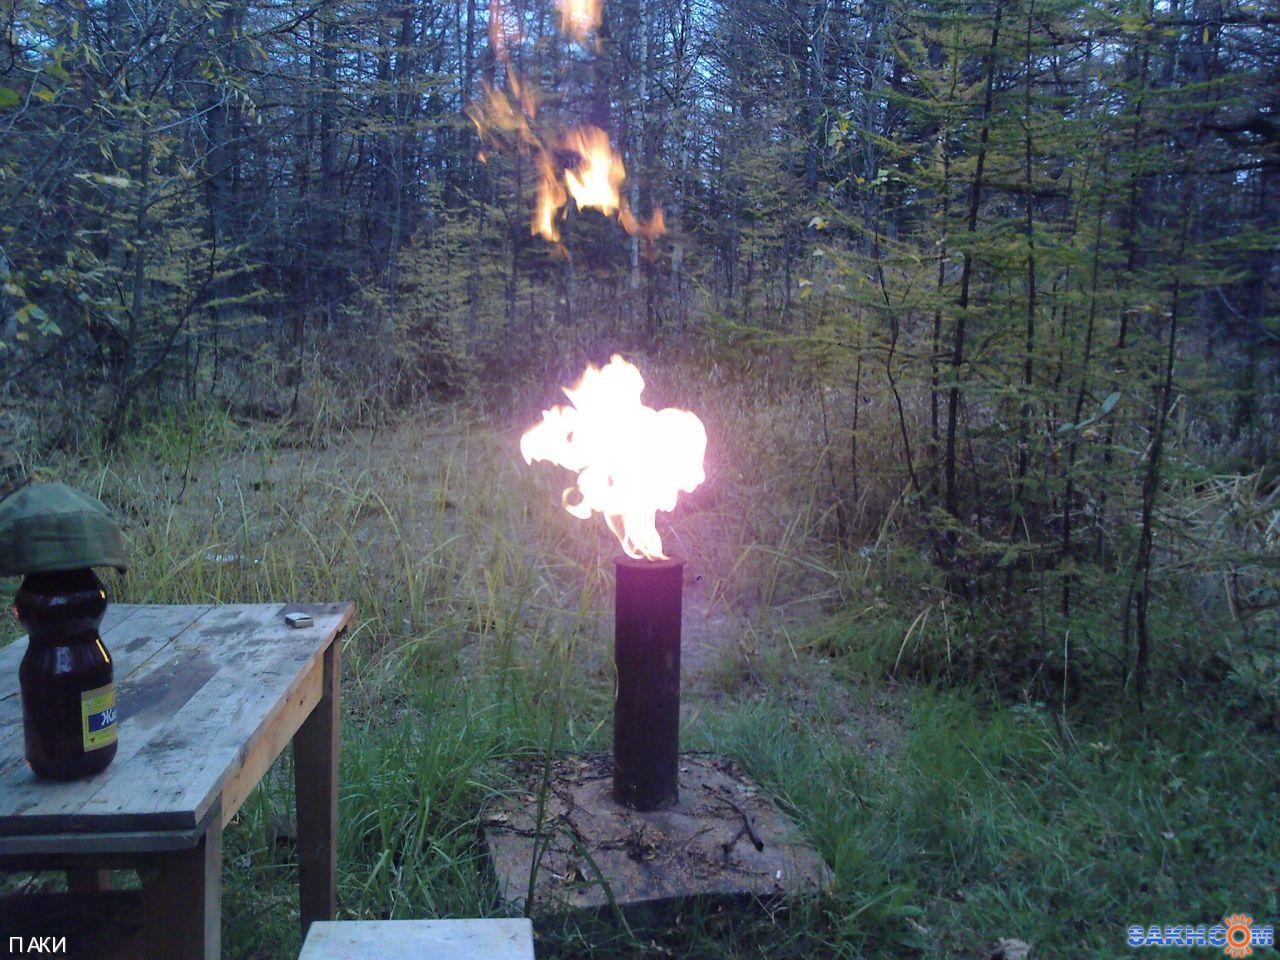 ПАКИ: Факел